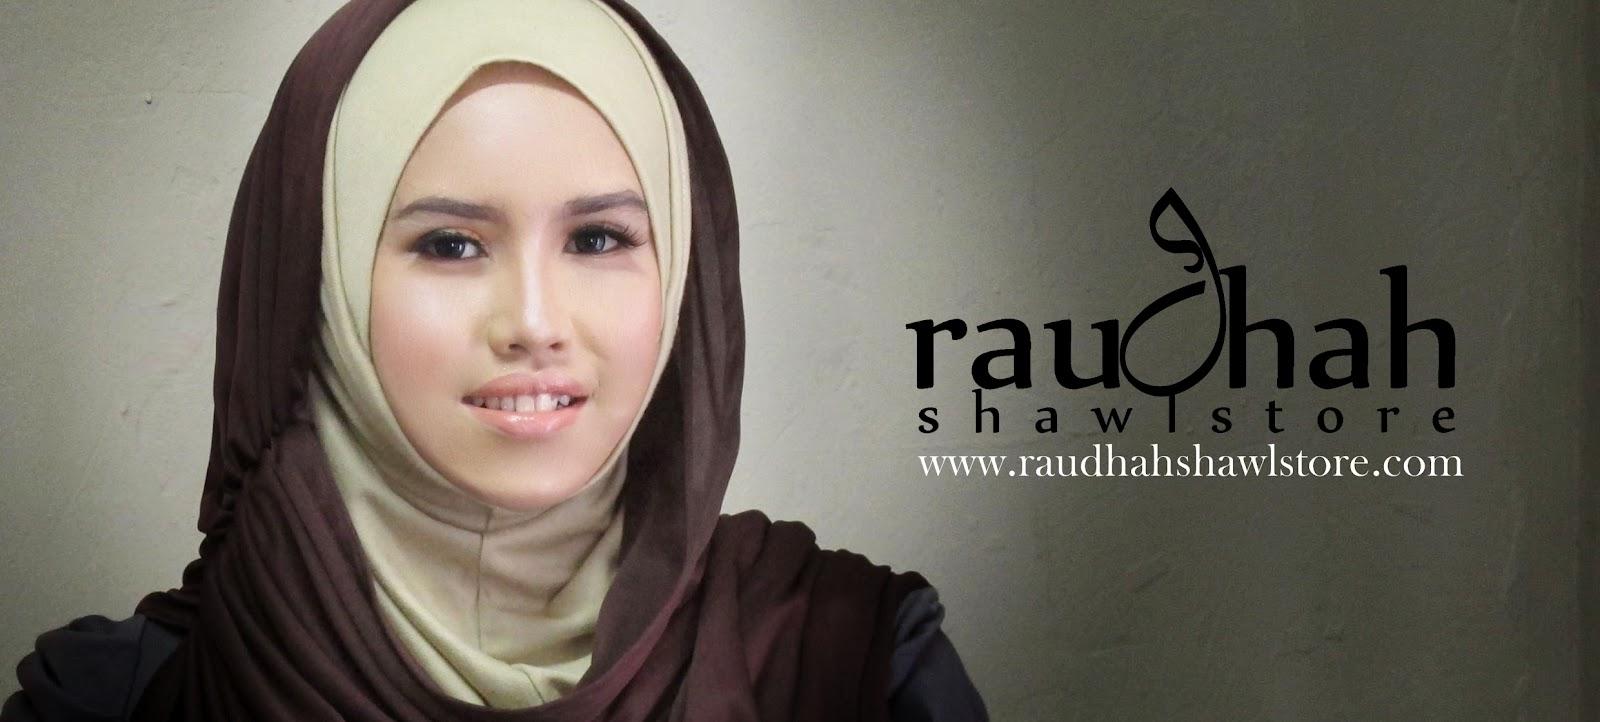 Selamat datang ke Online Butik Raudhah Shawl Store.